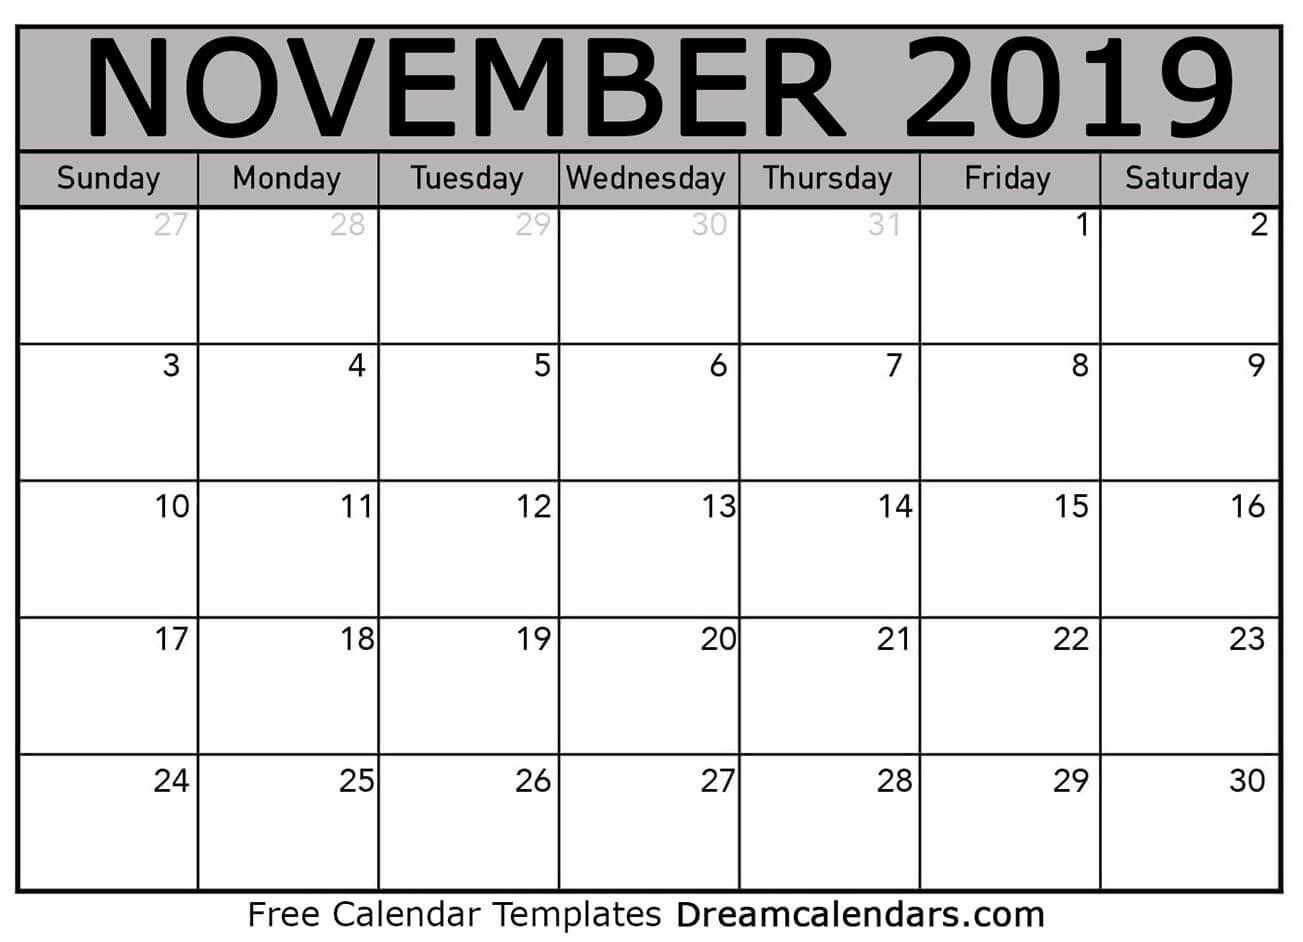 Dream Calendars Make your calendar template blog